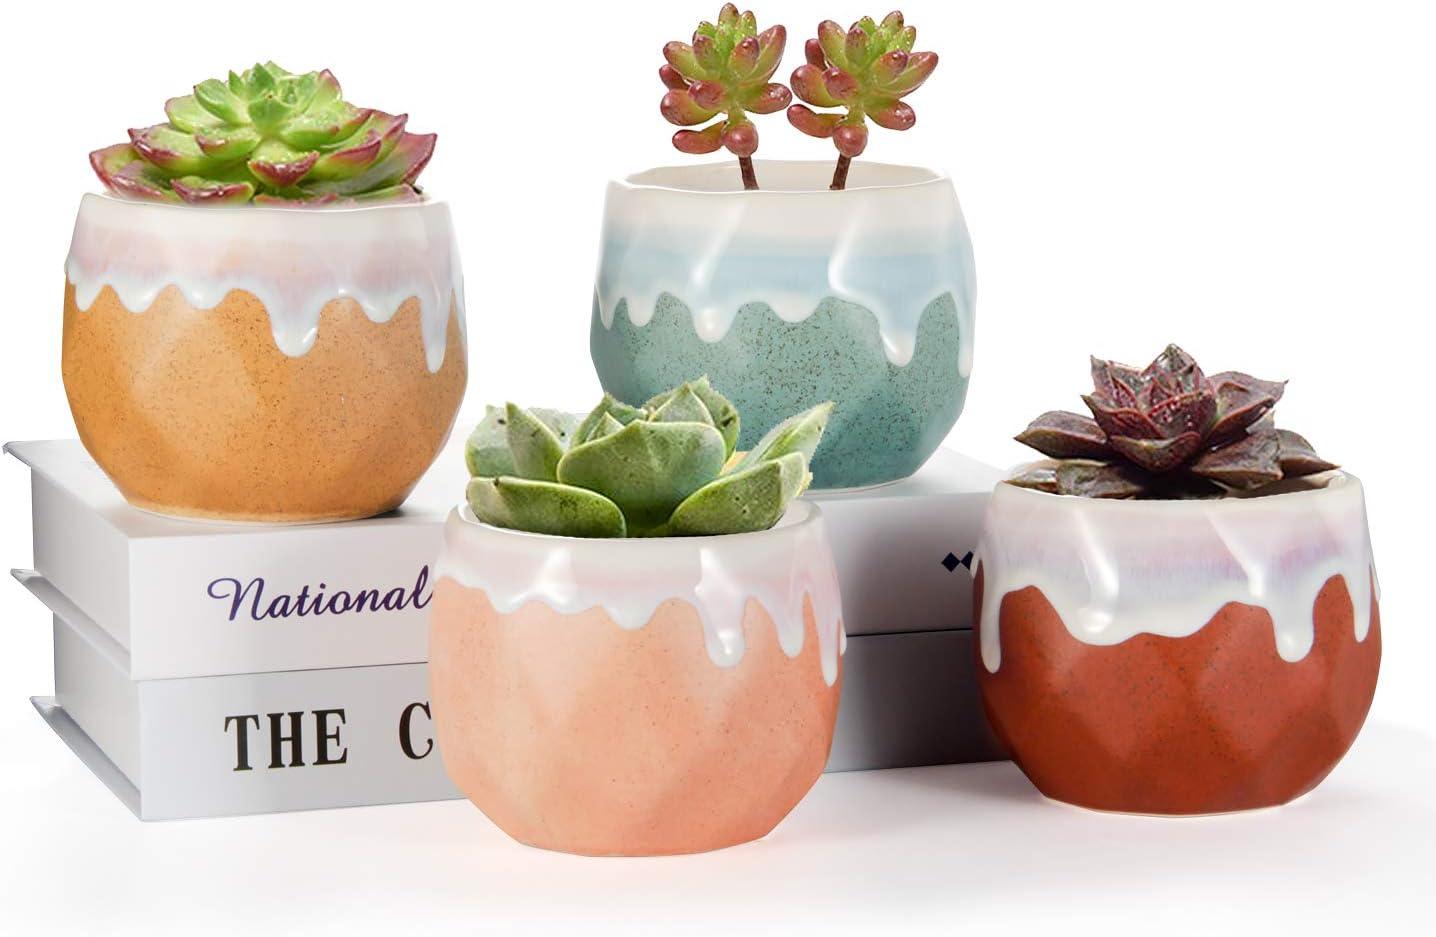 EHWINE Succulent Pots 4 PCS, 3.5 Inch Indoor Plant Pots with Drainage Hole, Natural Color Contrast Ceramic Pot Wonderful Decor for Gardening, Desk, Bookshelf,Living Room